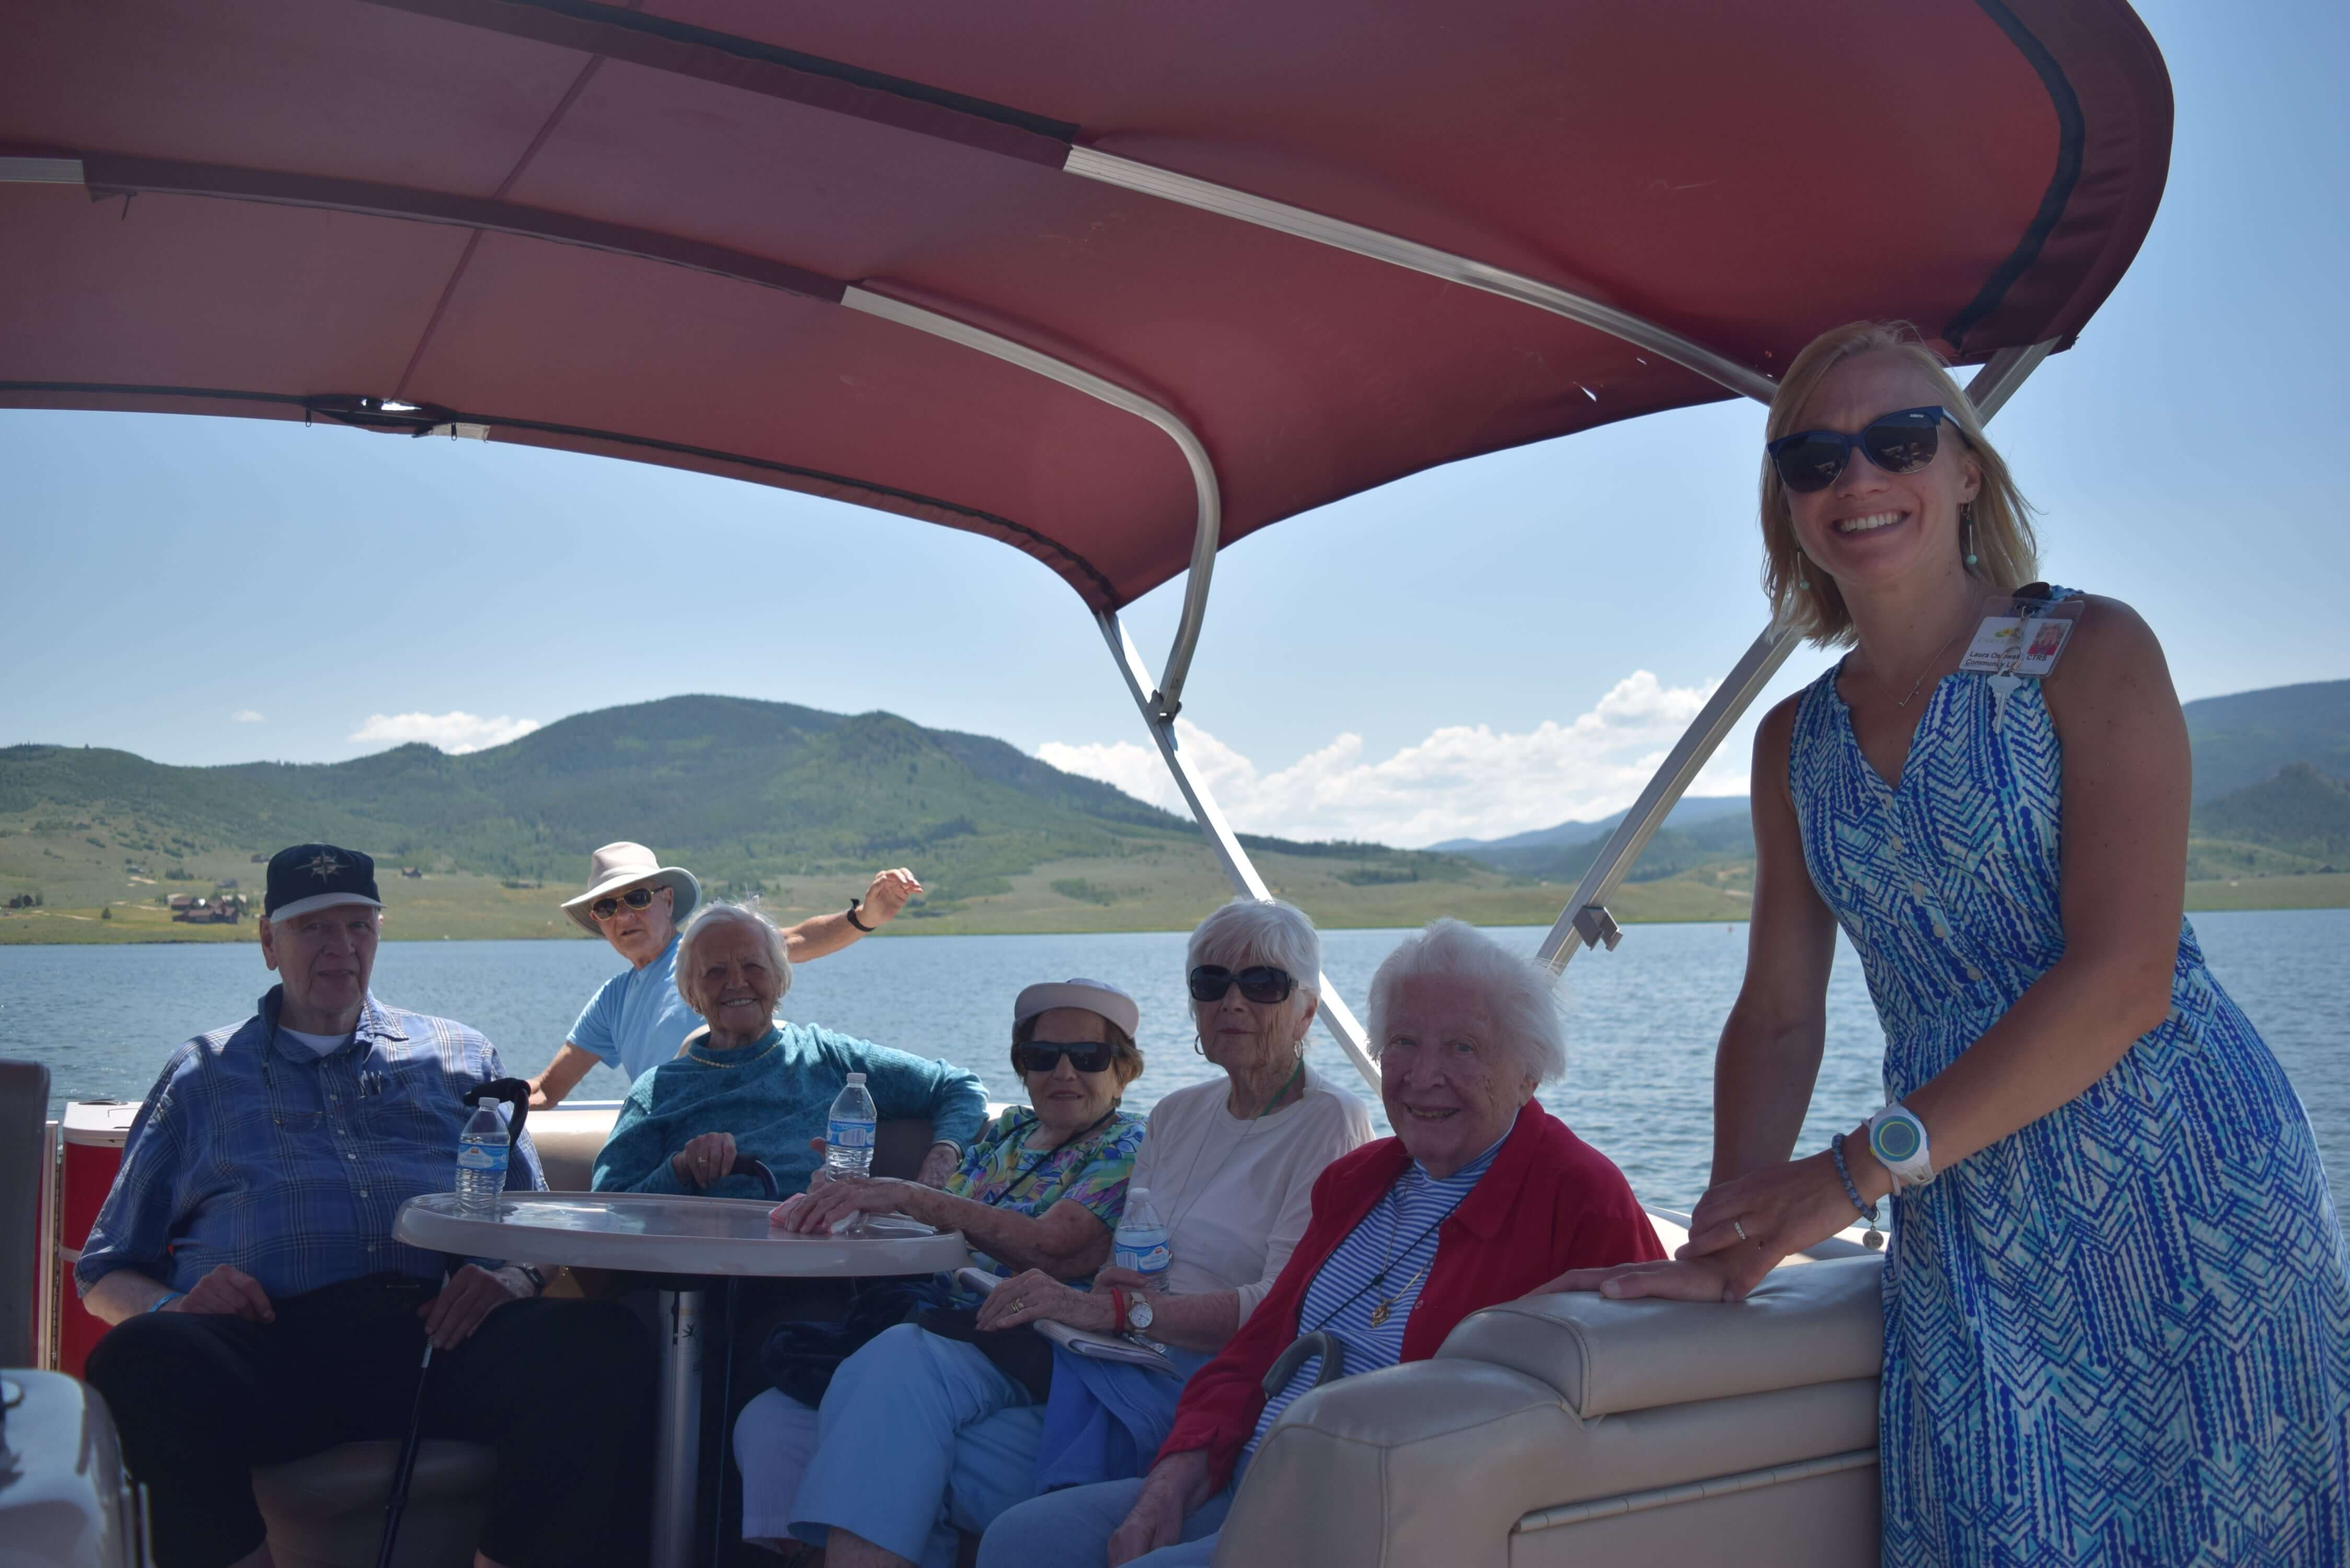 seniors having fun on a boat